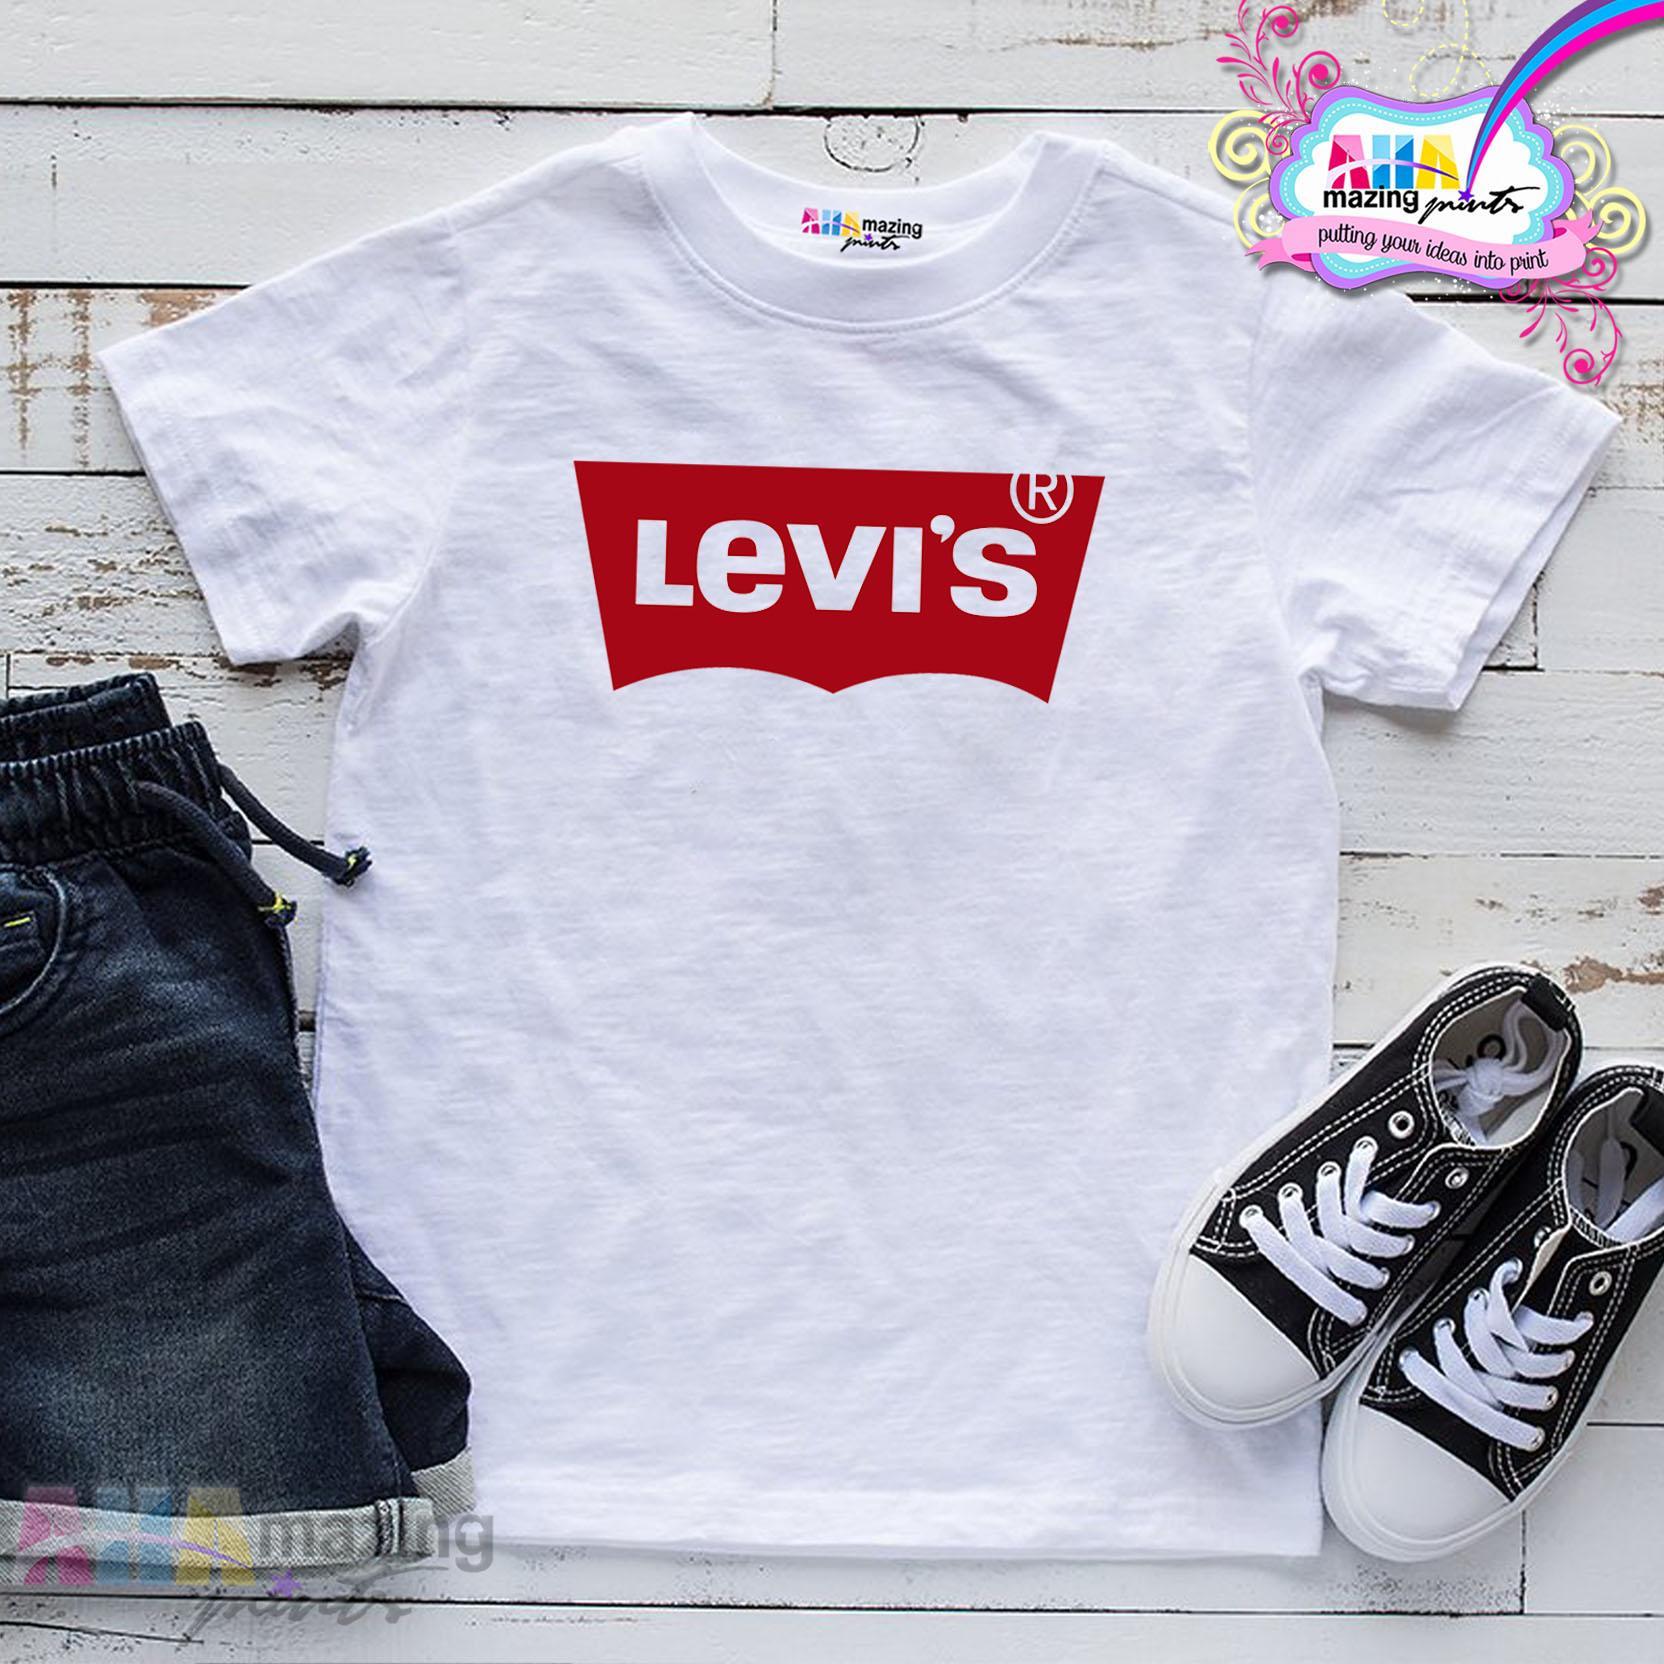 4e4d643ddd6e KIDS SHIRT ❤ LEVIS SHIRT for Little Boy ❤ Kids Fashion Top Boys Little Boys  AHAmazing